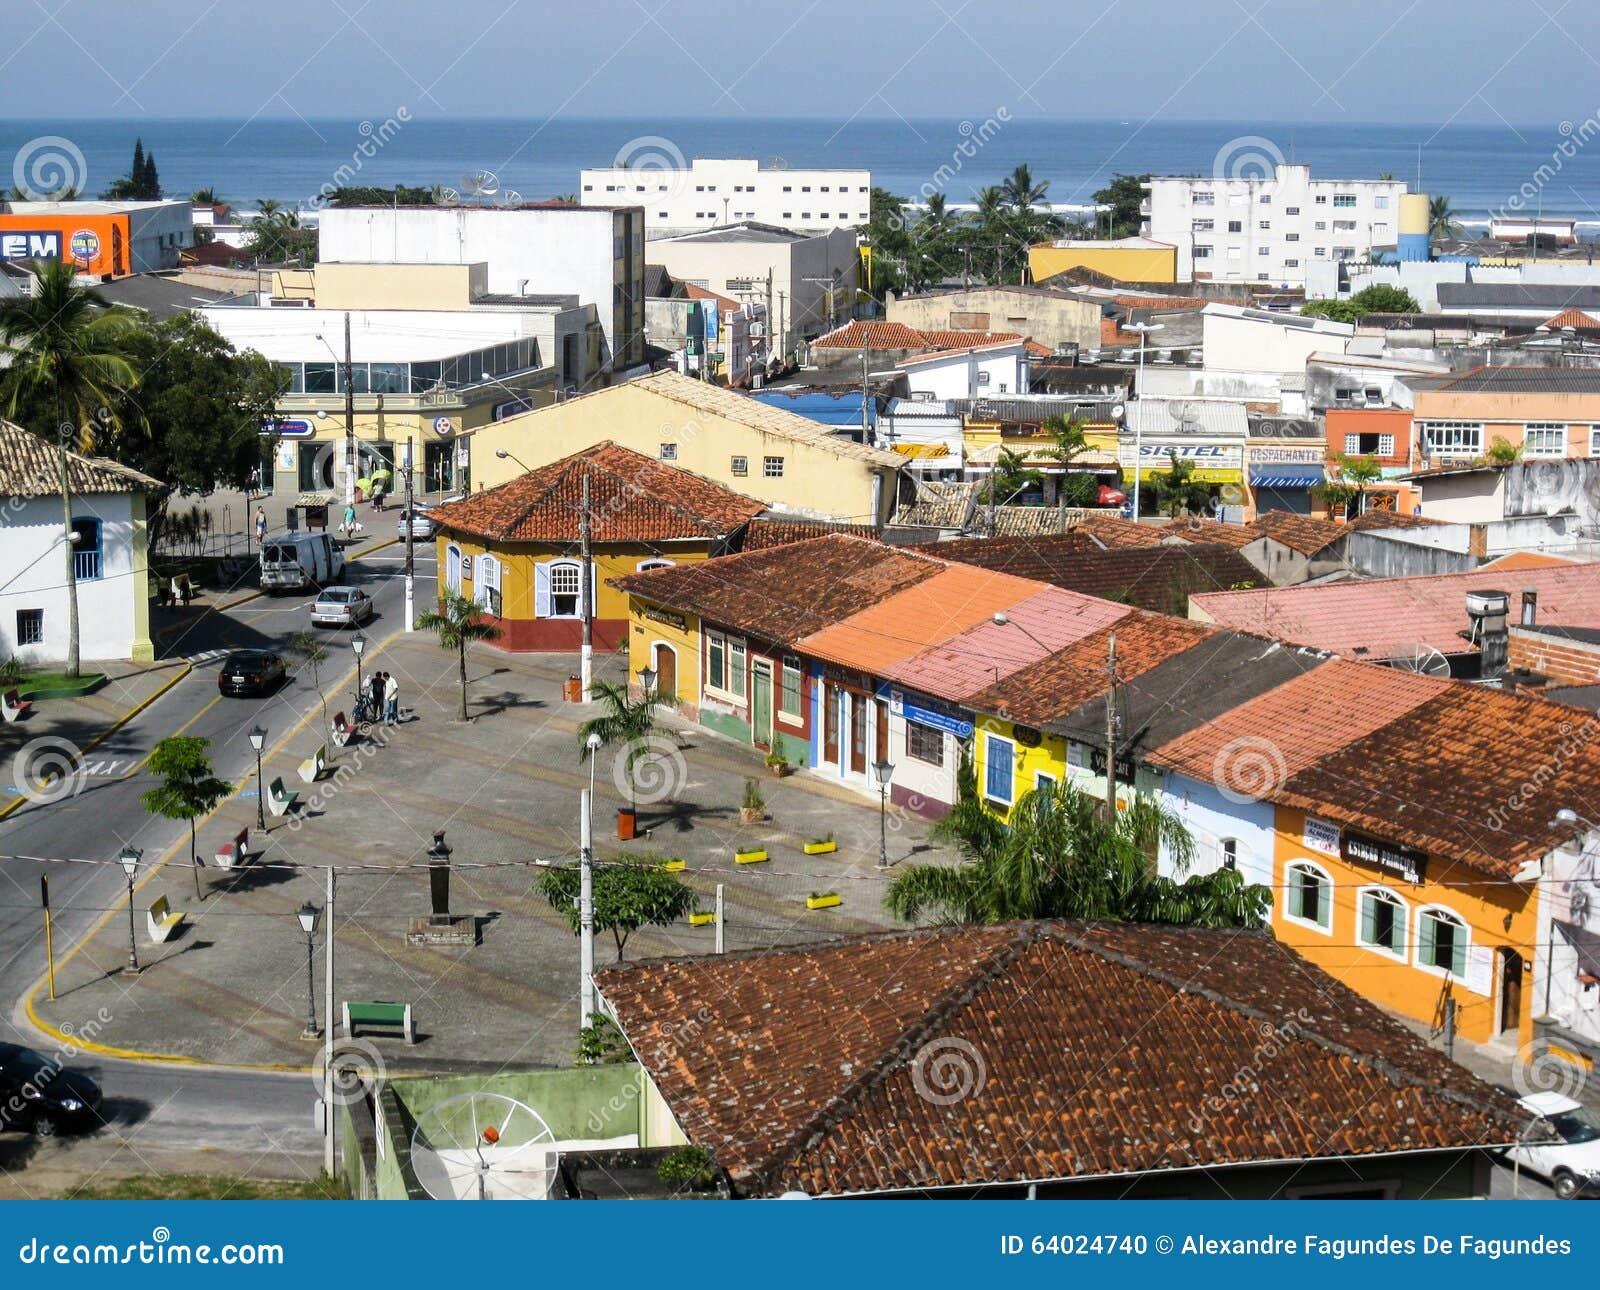 Historical housing itanhaem sao paulo brazil editorial for Apartments in sao paulo brazil